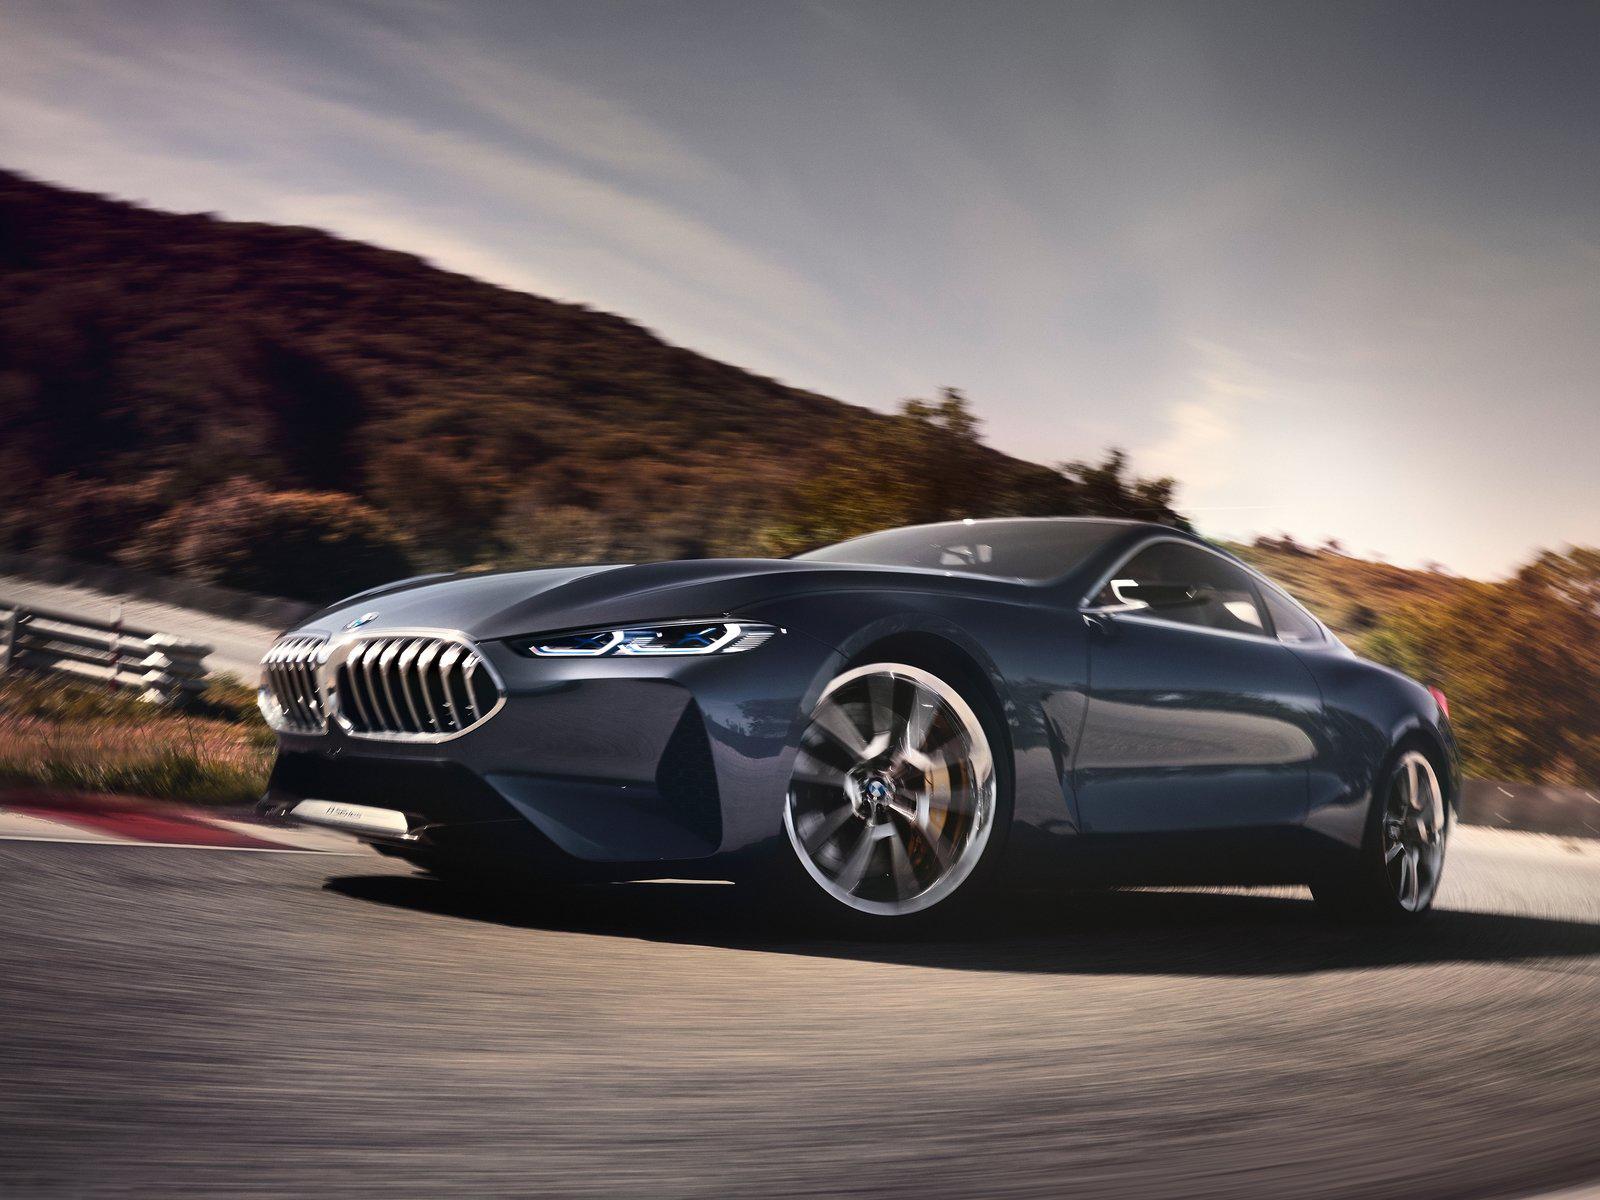 BMW-8-Series_Concept-2017-1600-06.jpg